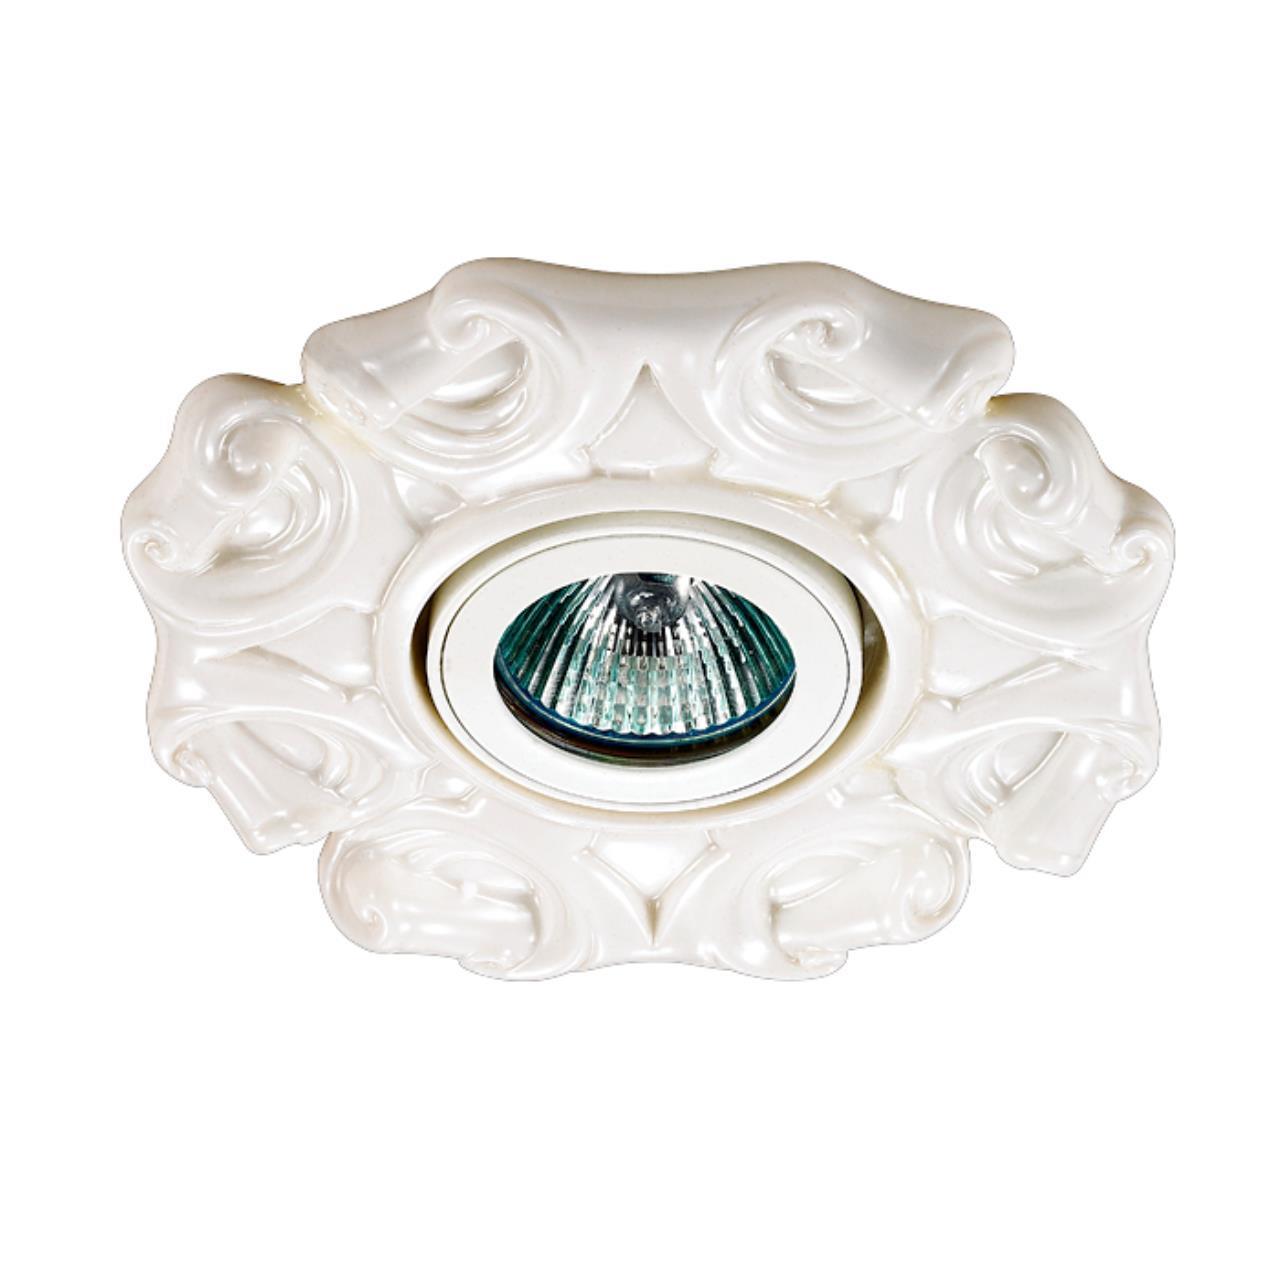 370040 SPOT NT15 120 белый Встраиваемый светильник IP20 GX5.3 50W 12V FARFOR